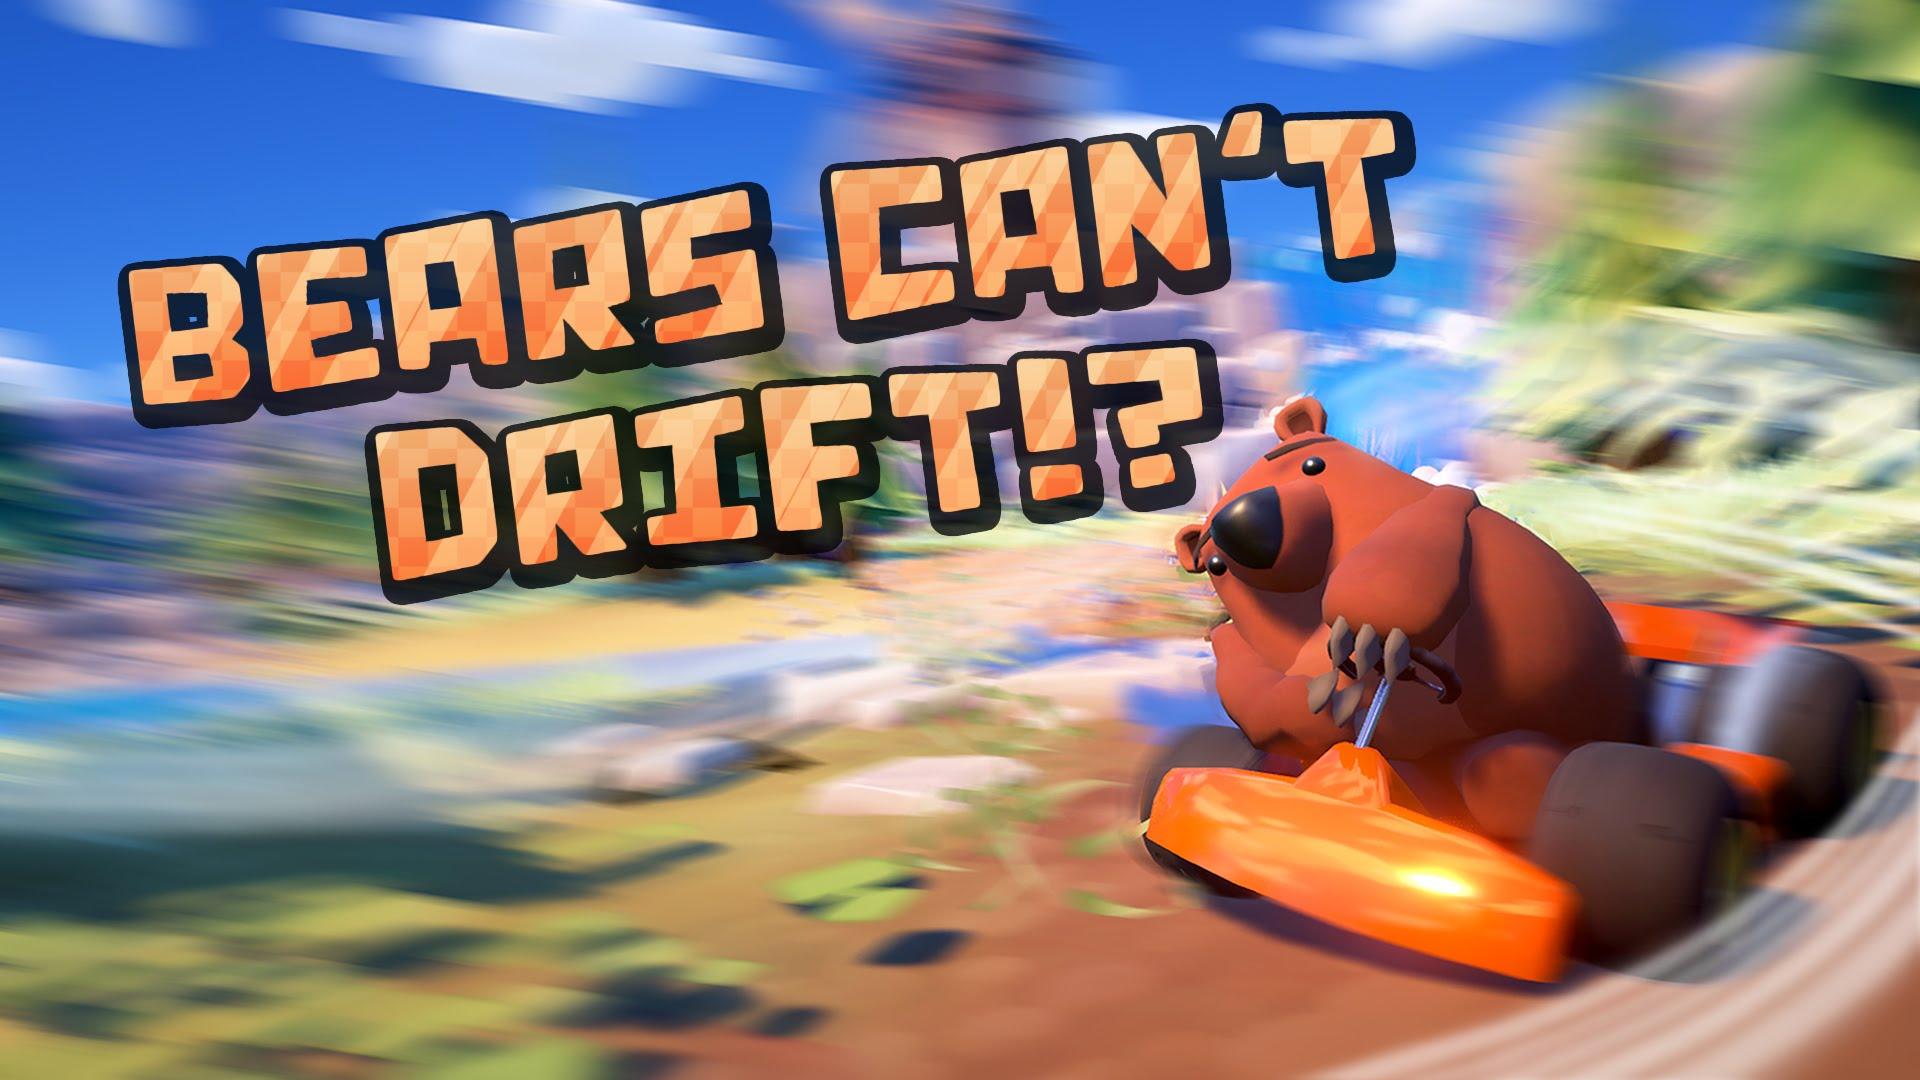 bears-cant-drift